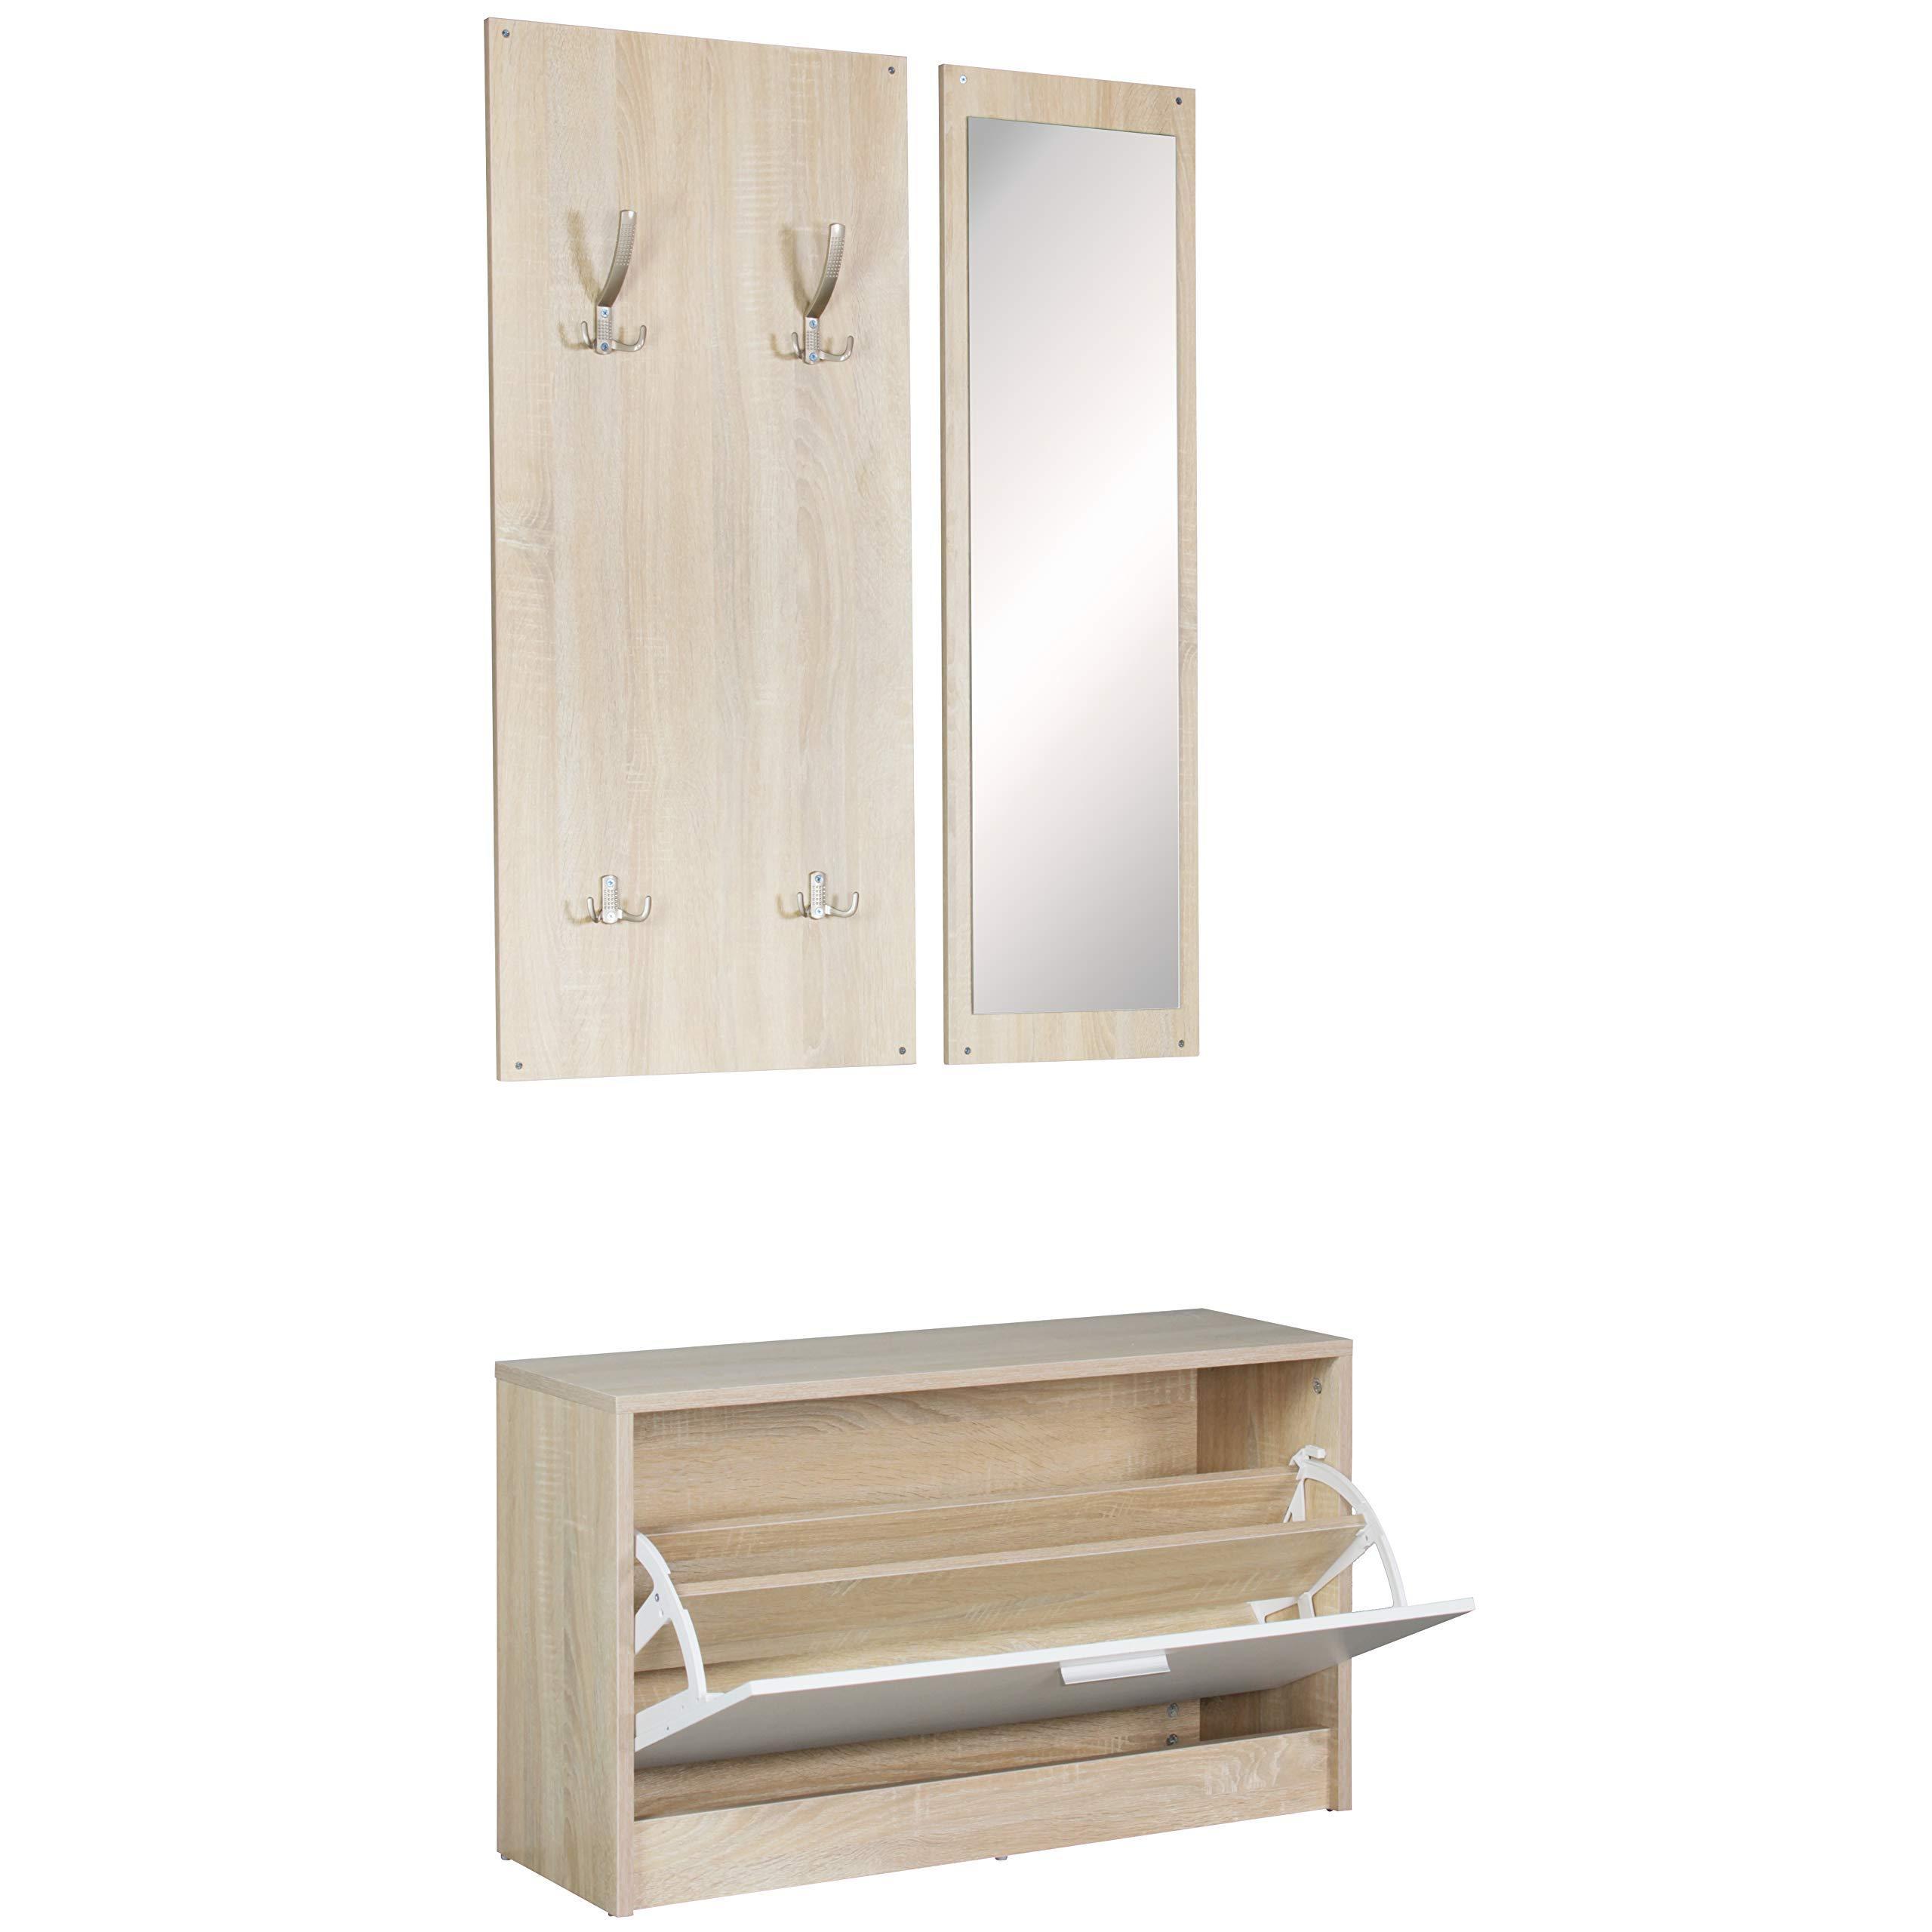 Garderobe Schmal Holz